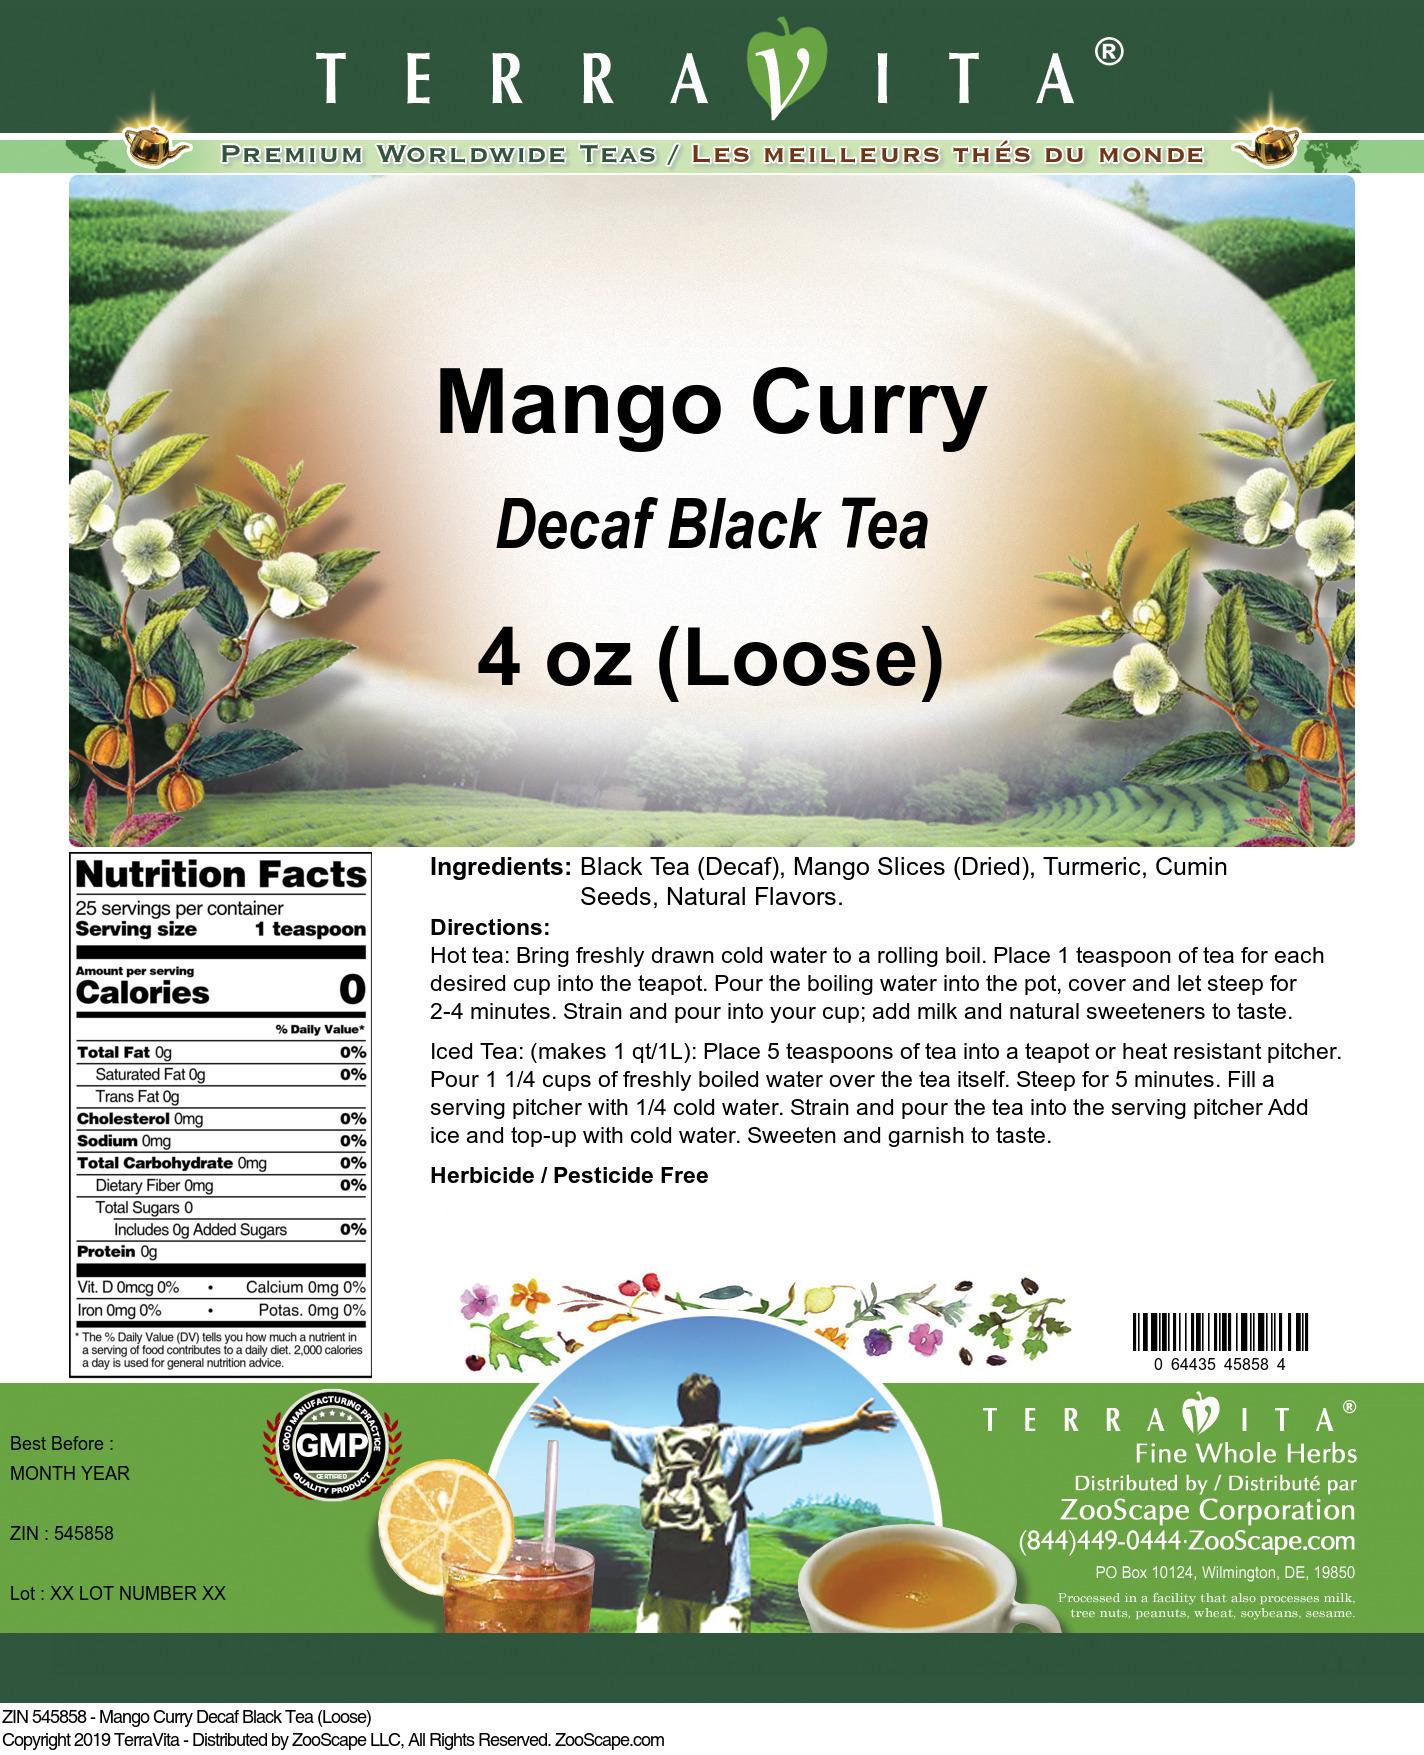 Mango Curry Decaf Black Tea (Loose)